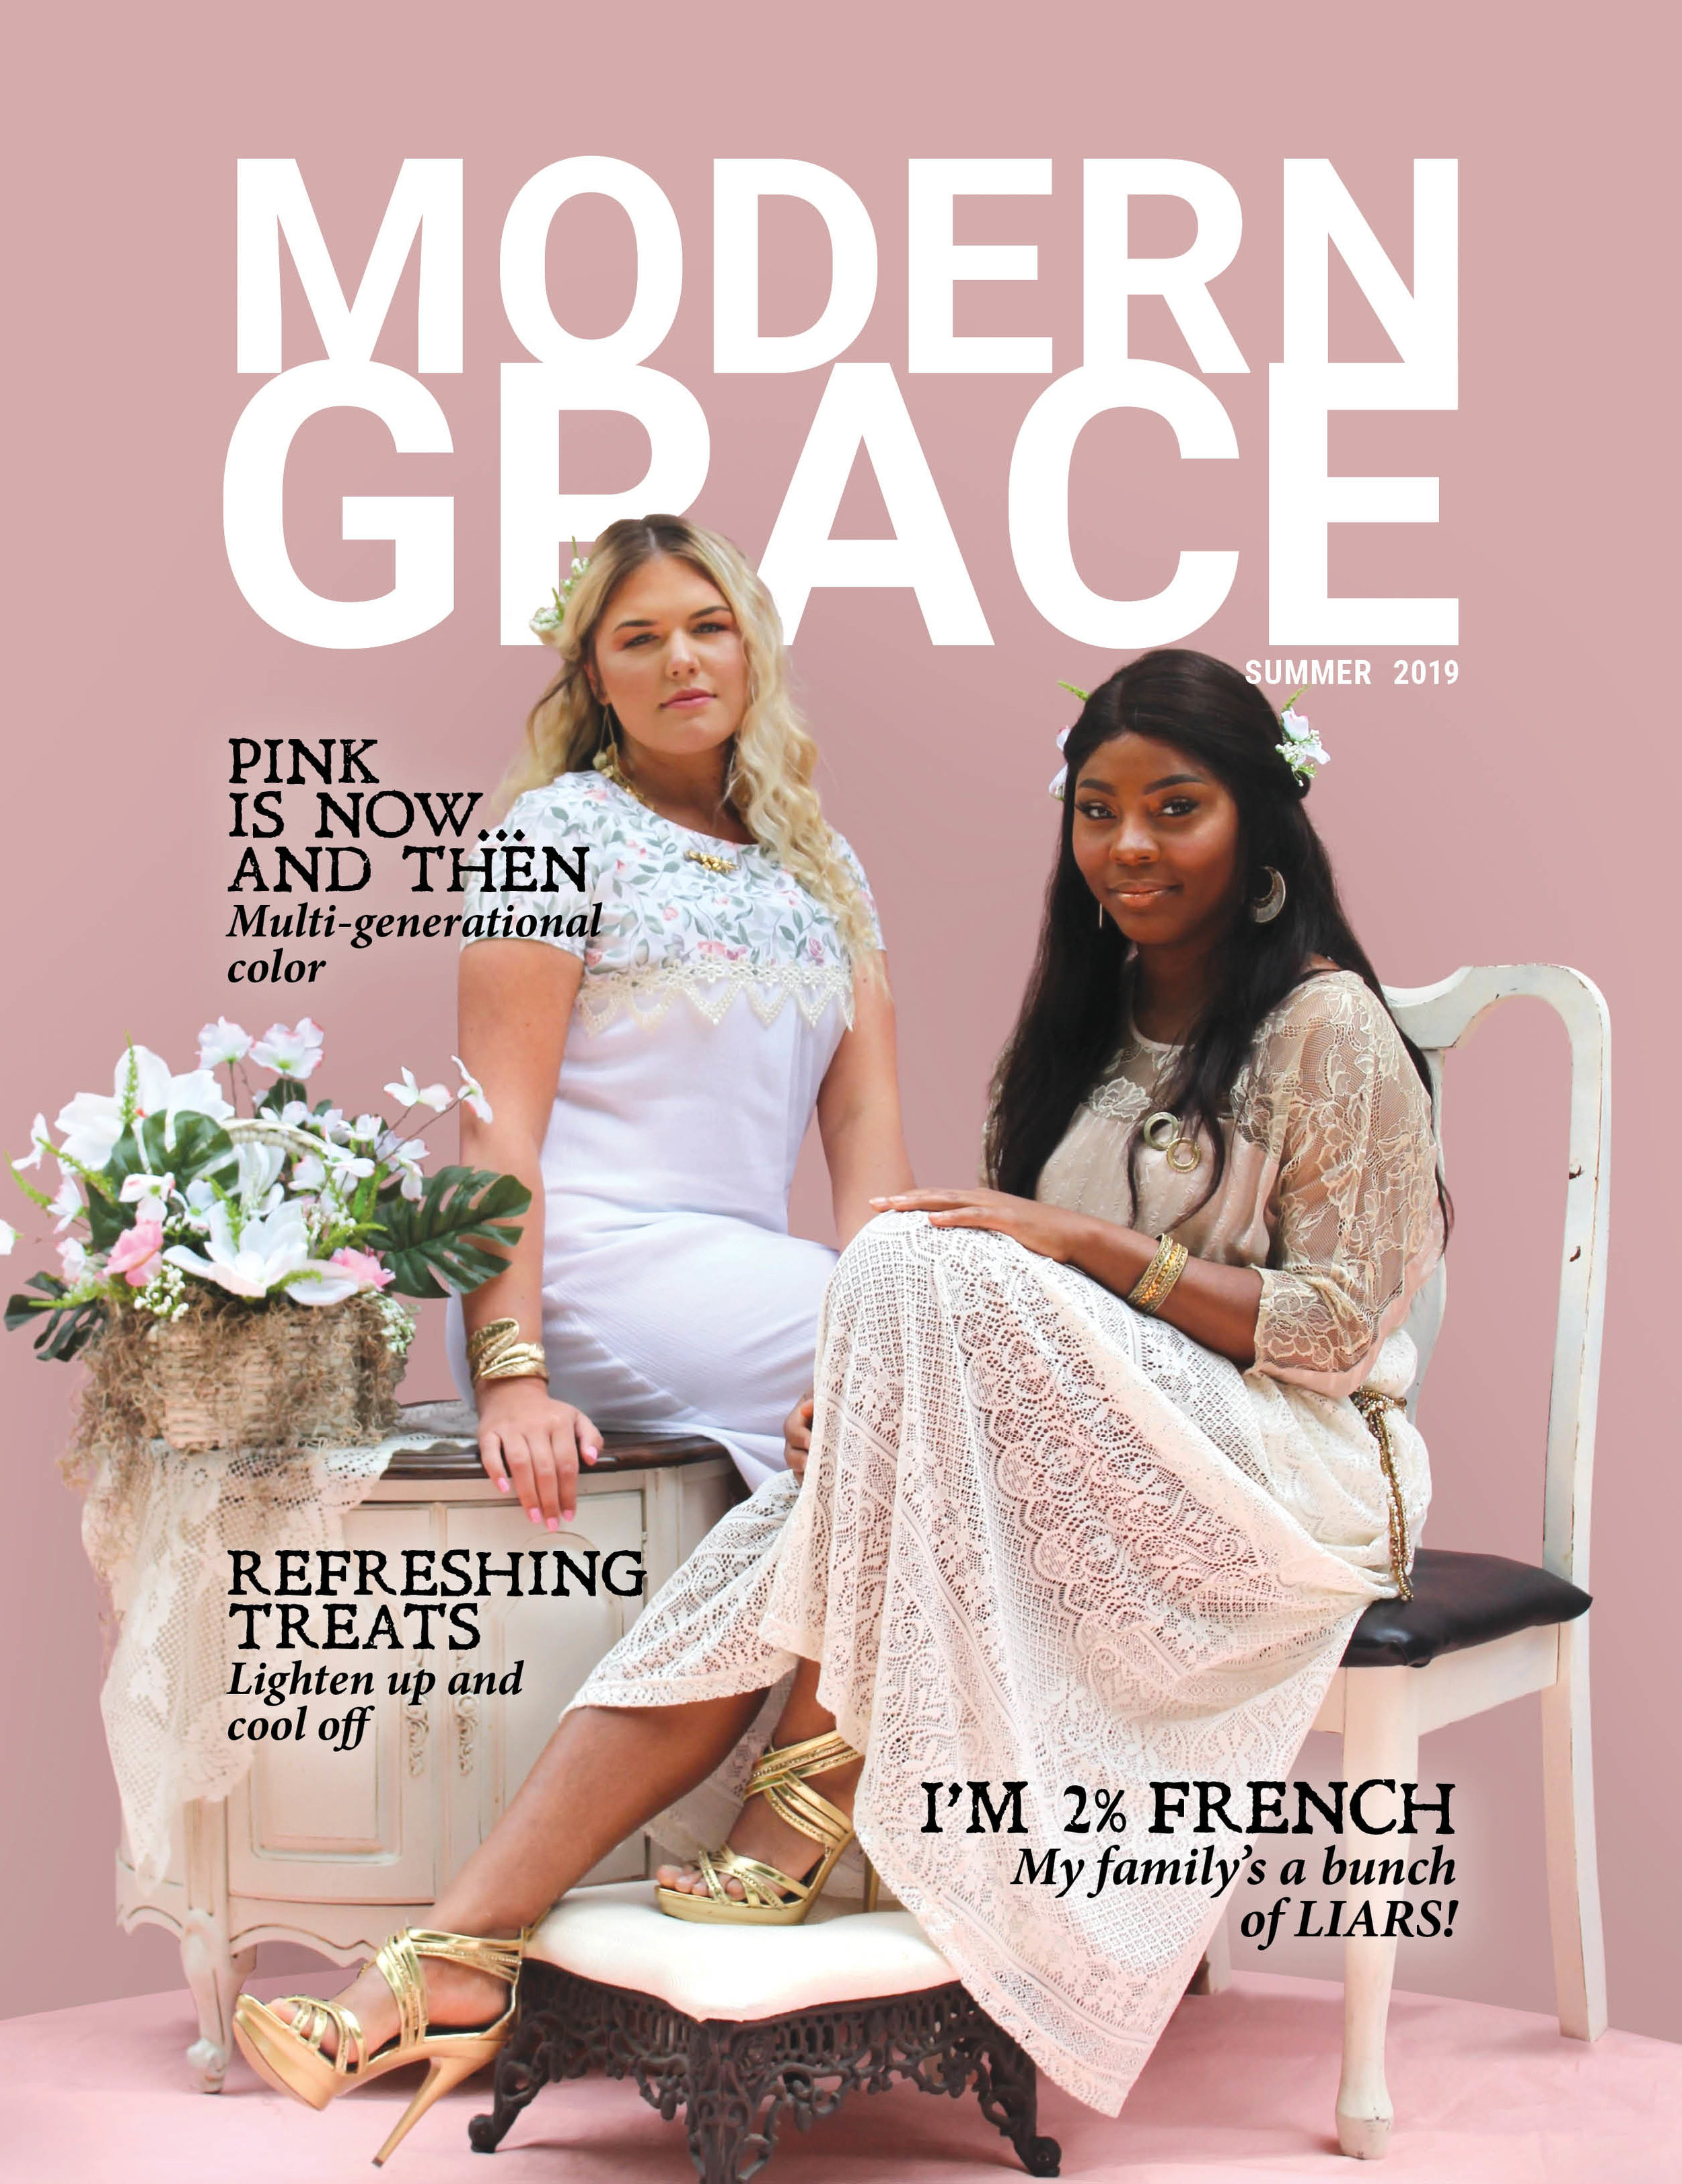 Modern Grace Magazine Summer 2019.jpg